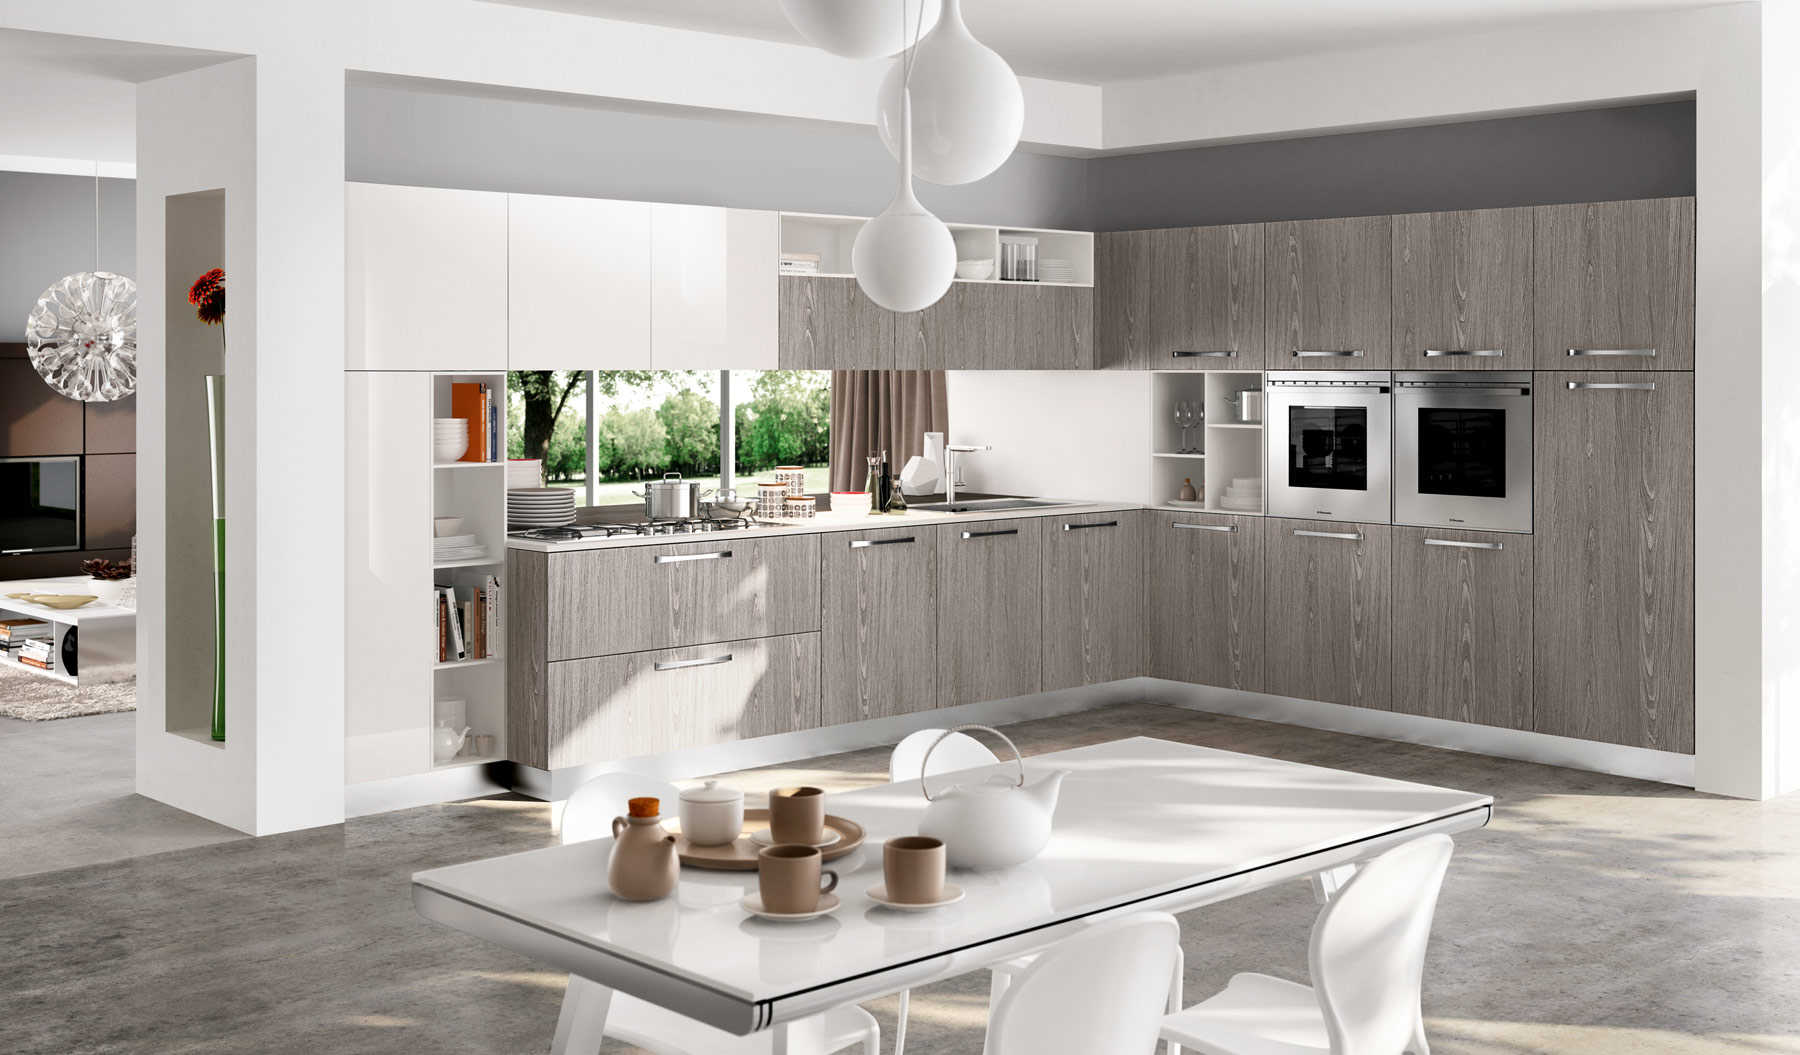 Emejing Riviste Arredamento Cucine Contemporary - Design & Ideas ...